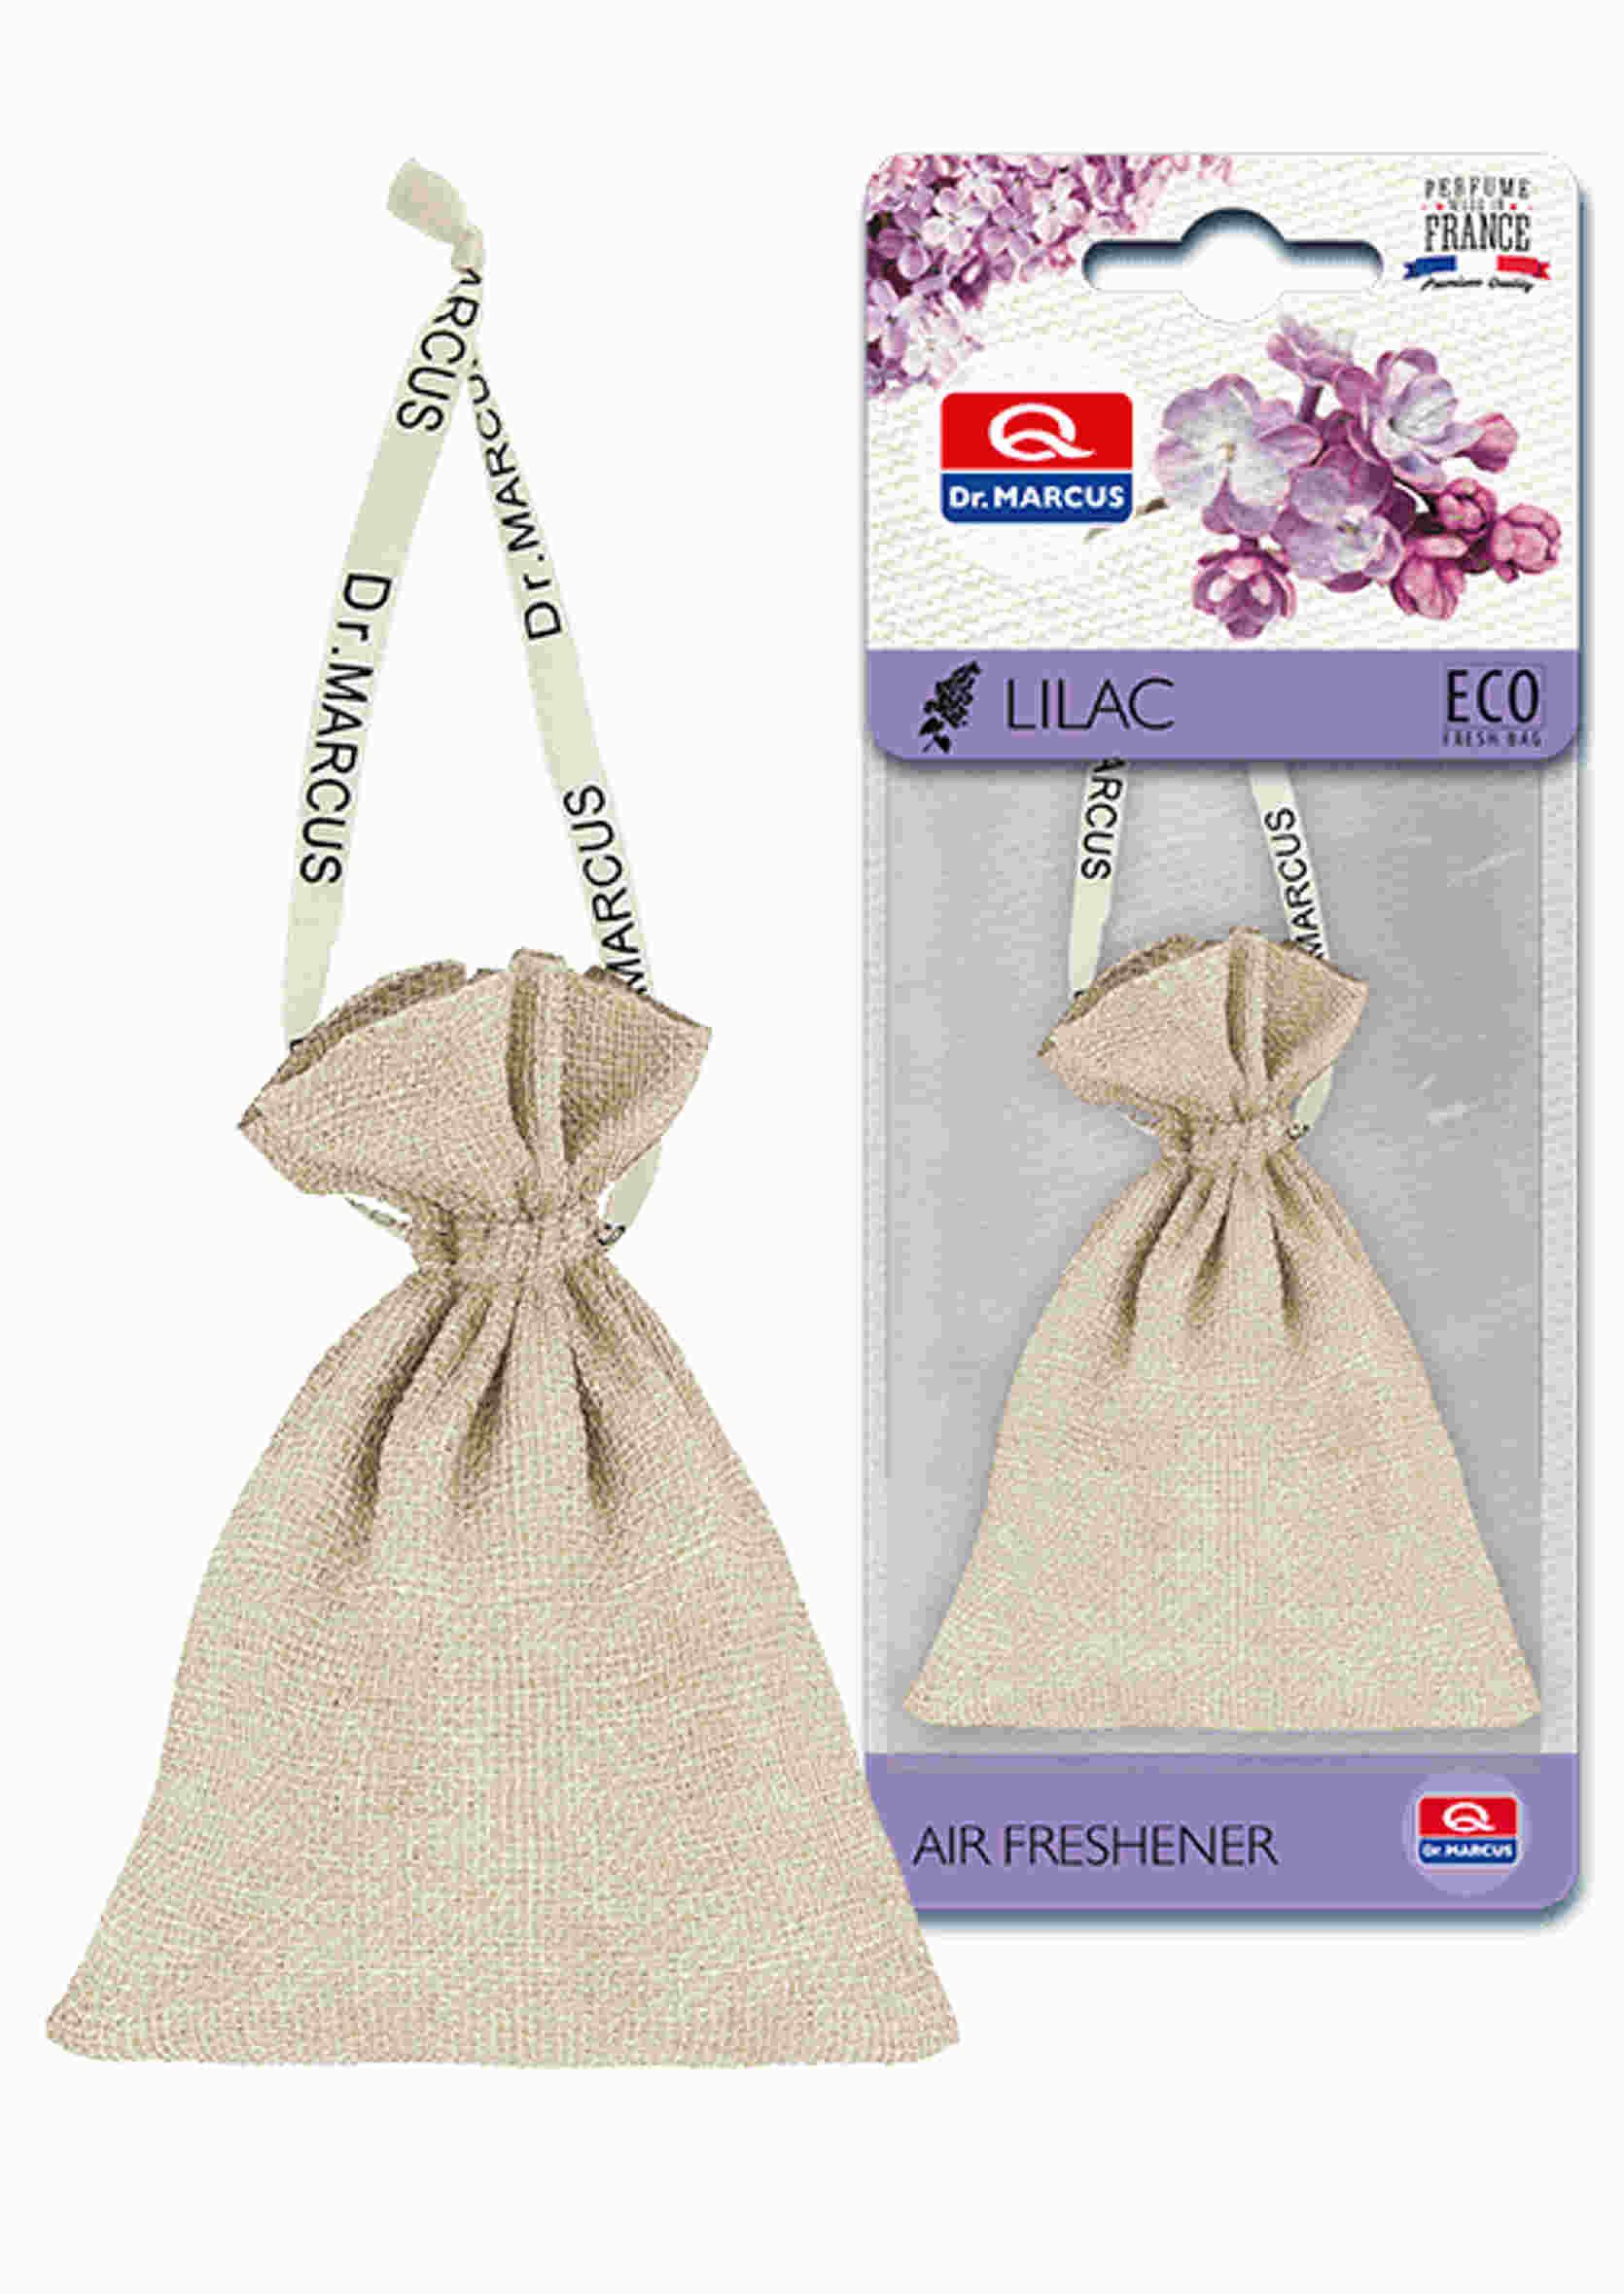 Dr. Marcus Fresh Bag Eco Lilia 20g Zapach Samochodowy Sakiewka